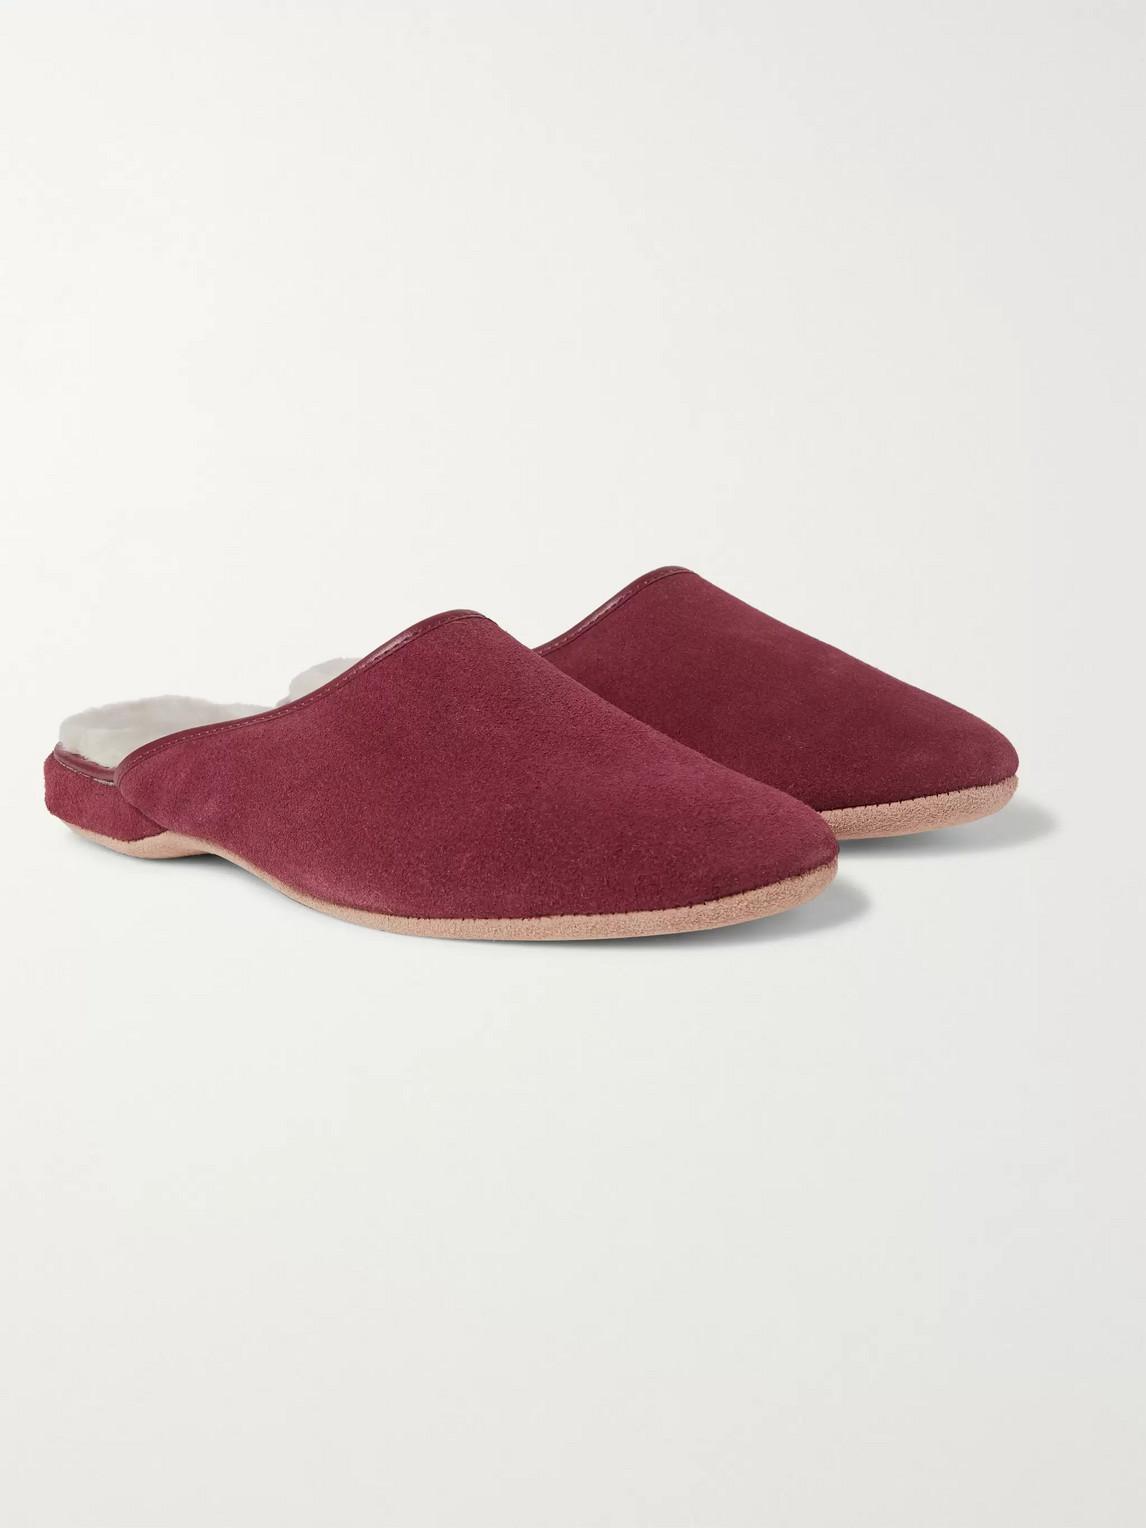 derek rose - douglas shearling-lined suede slippers - burgundy - men